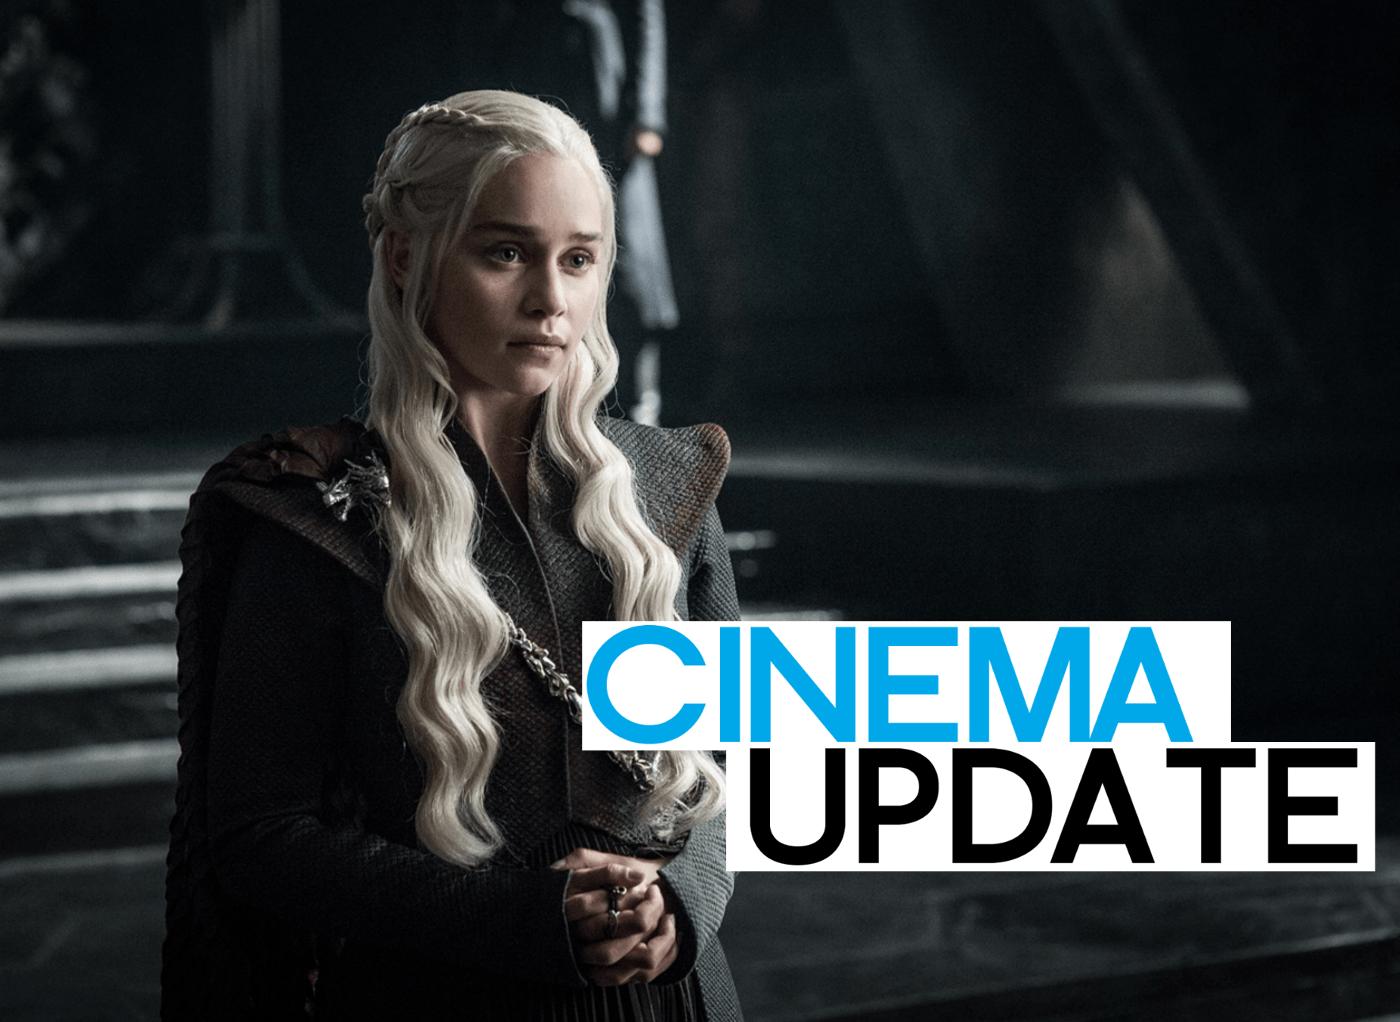 Cinema Update #57 – Rihanna und Lupita Nyong'o, Dark Universe, Justice League & GoT S7